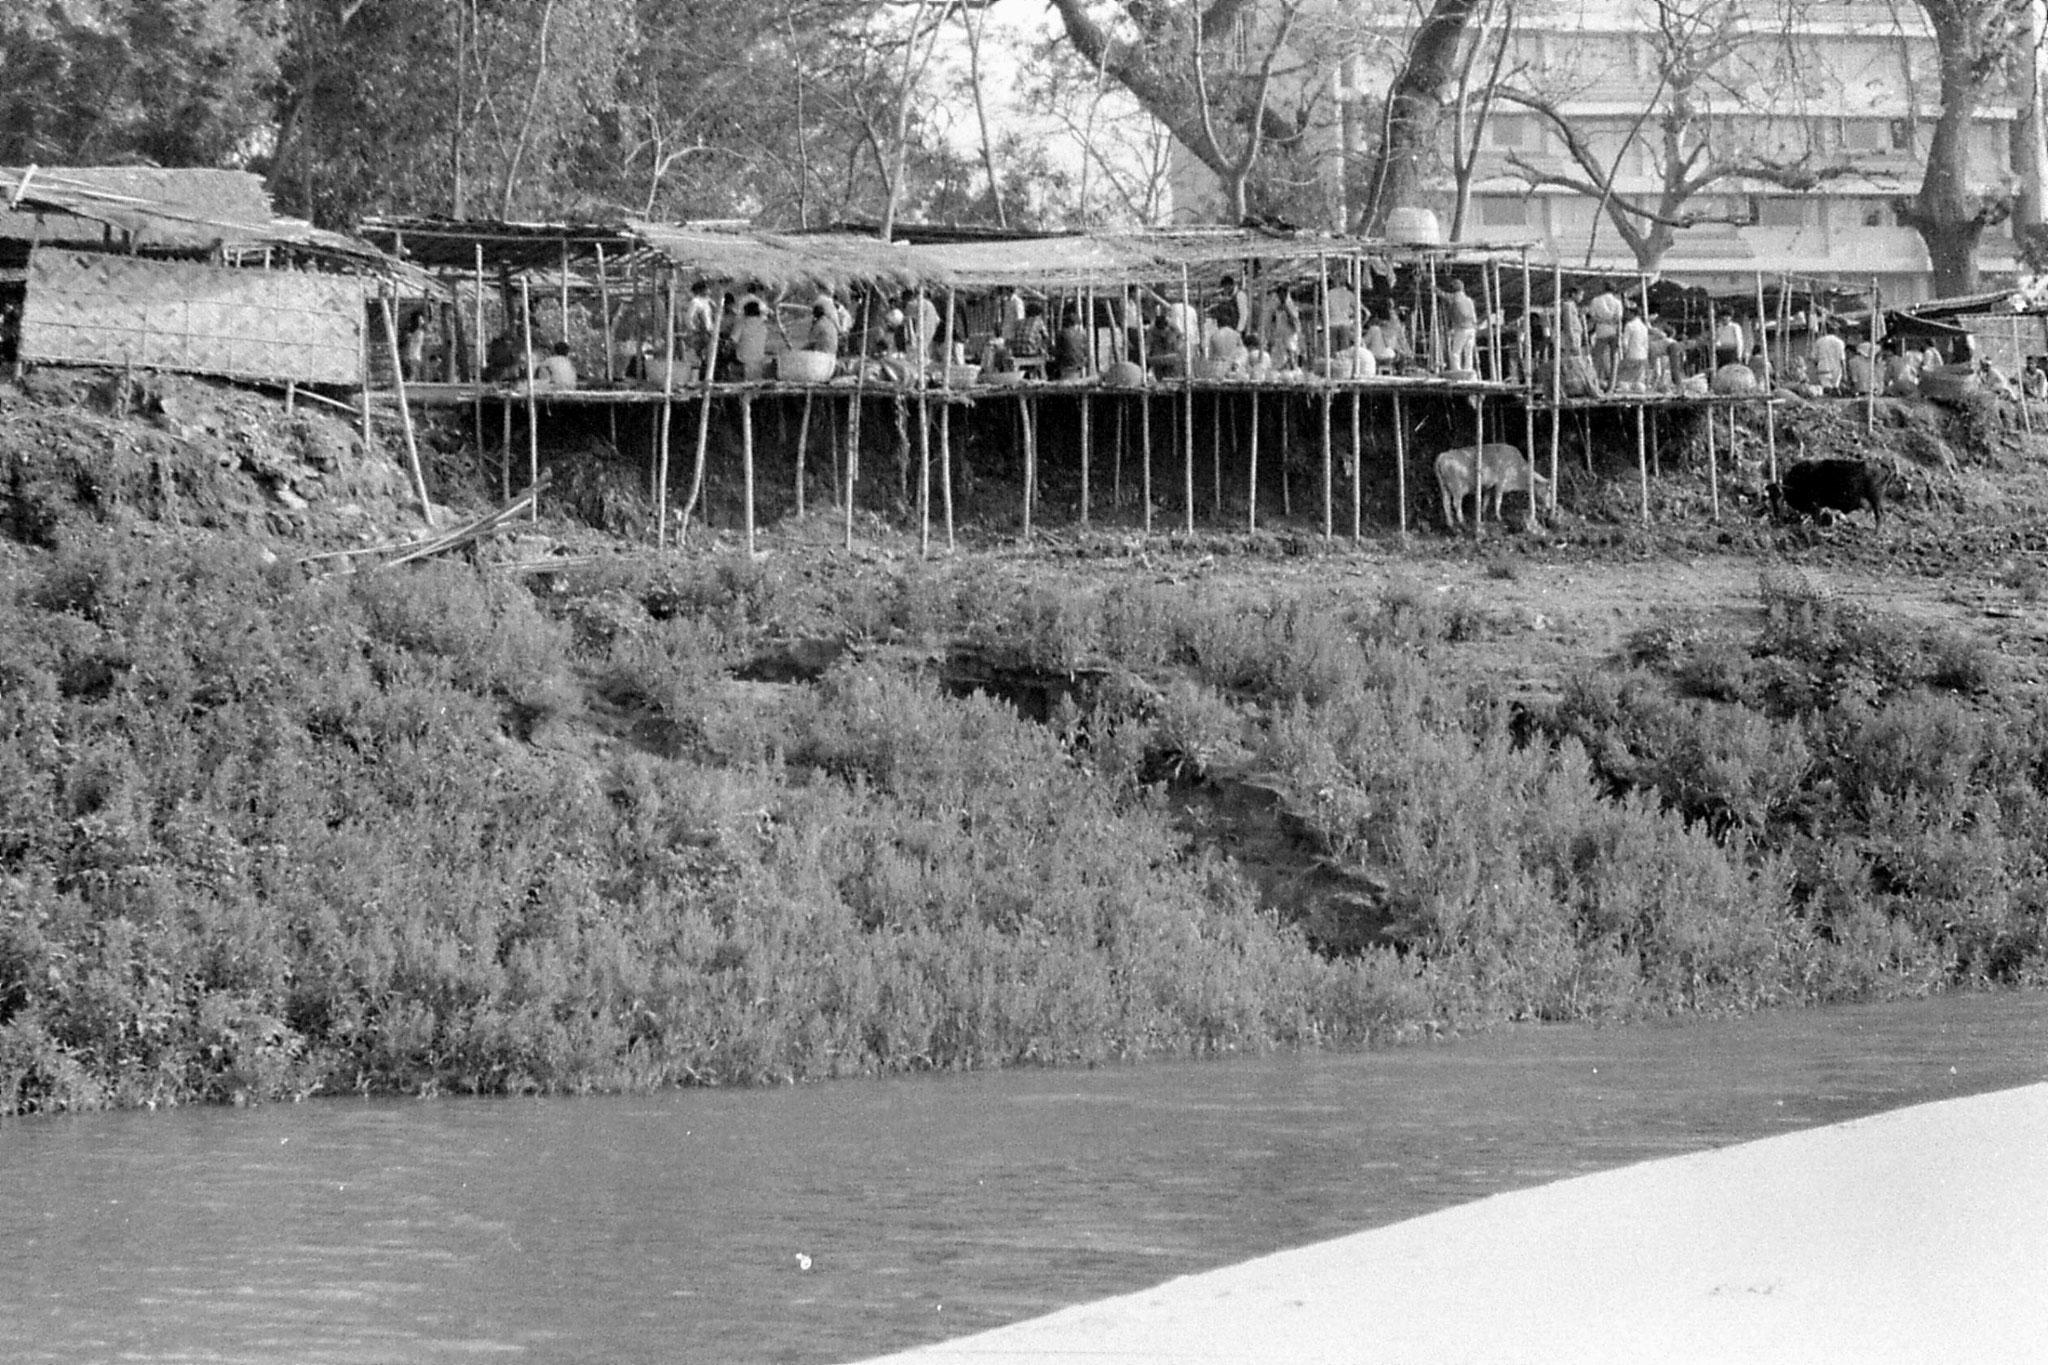 10/4/1990: 33: Gauhati, Brahmaputra River, market